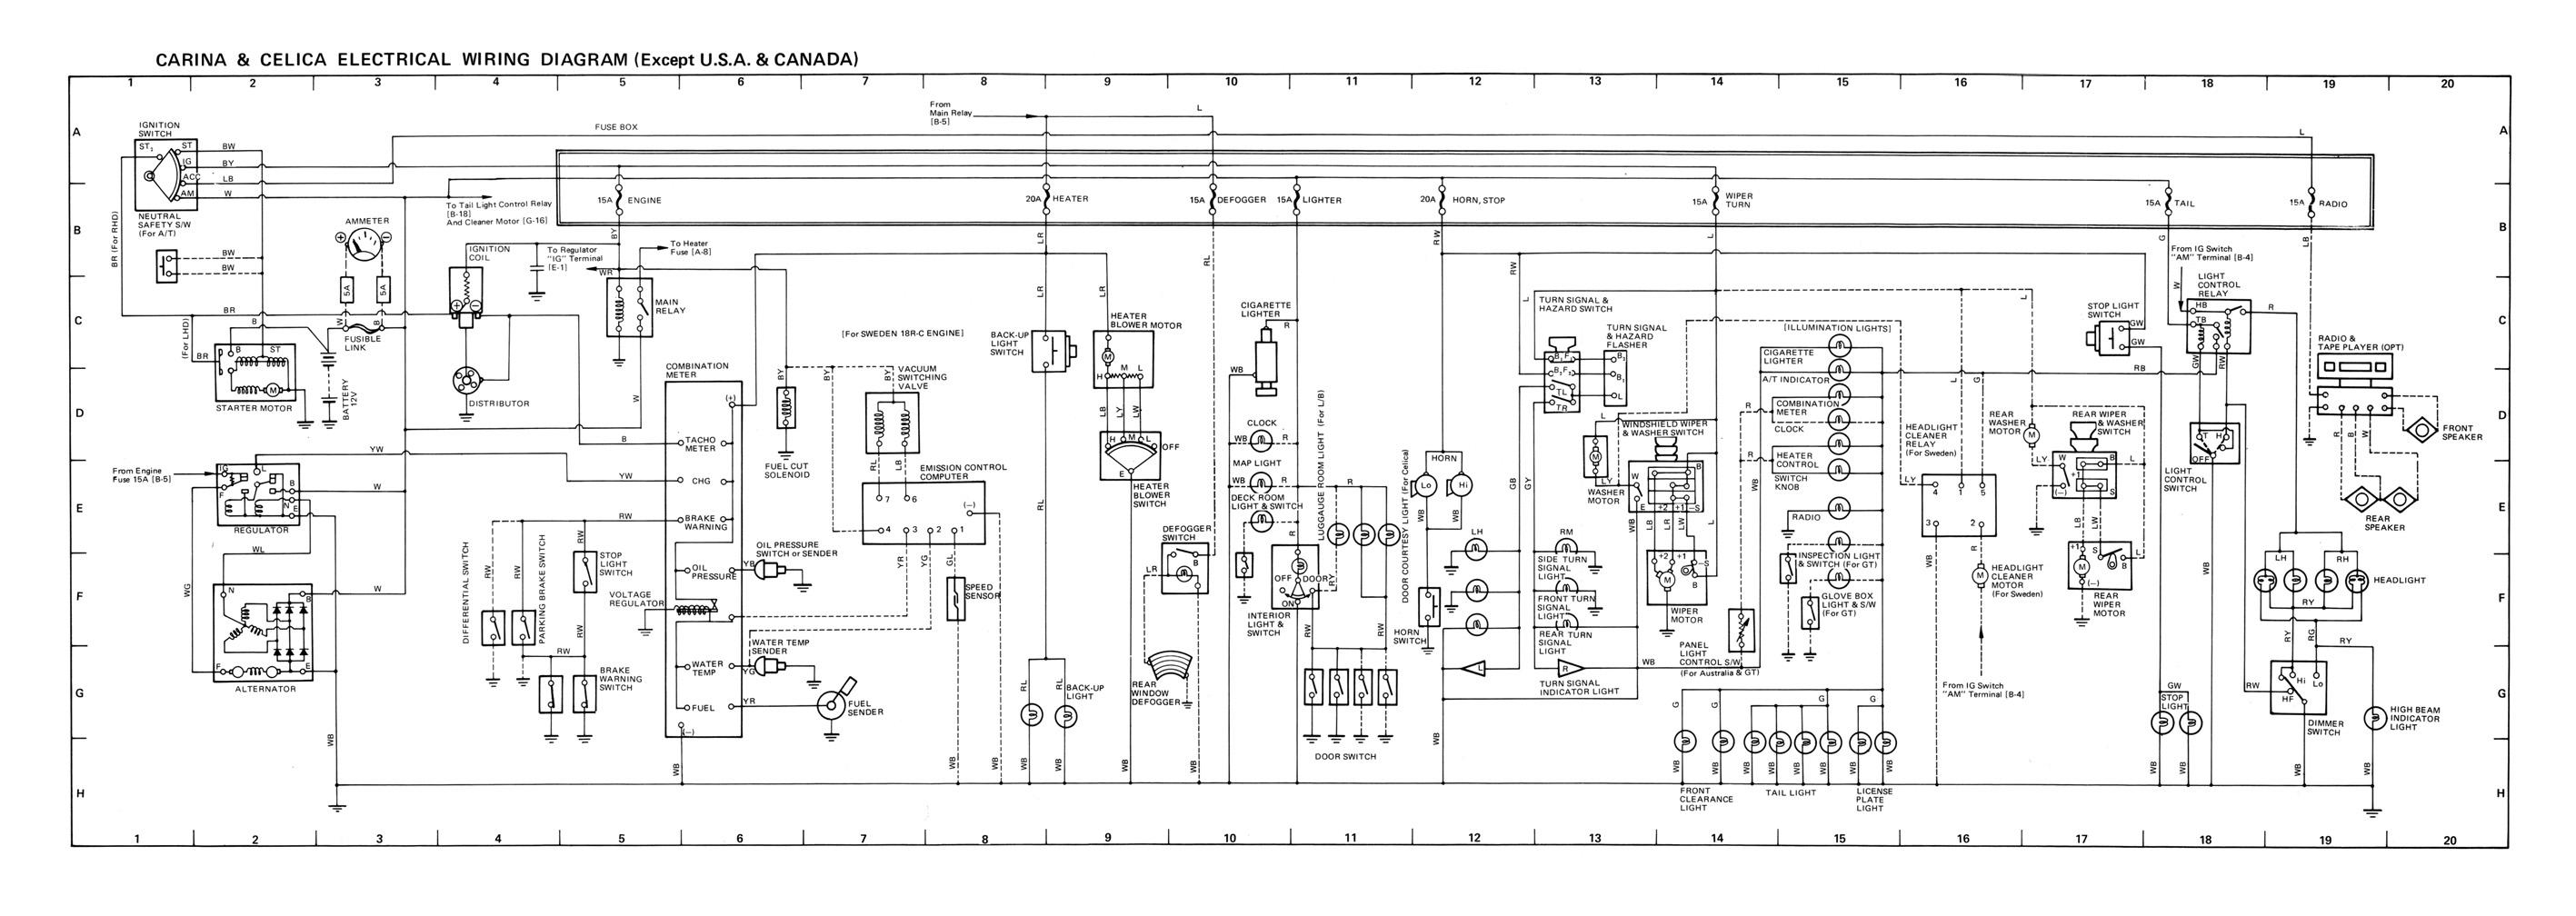 Porsche 911 Wiring Diagram Electrical Diagrams 1983 1986 Radio Trusted U2022 Dash